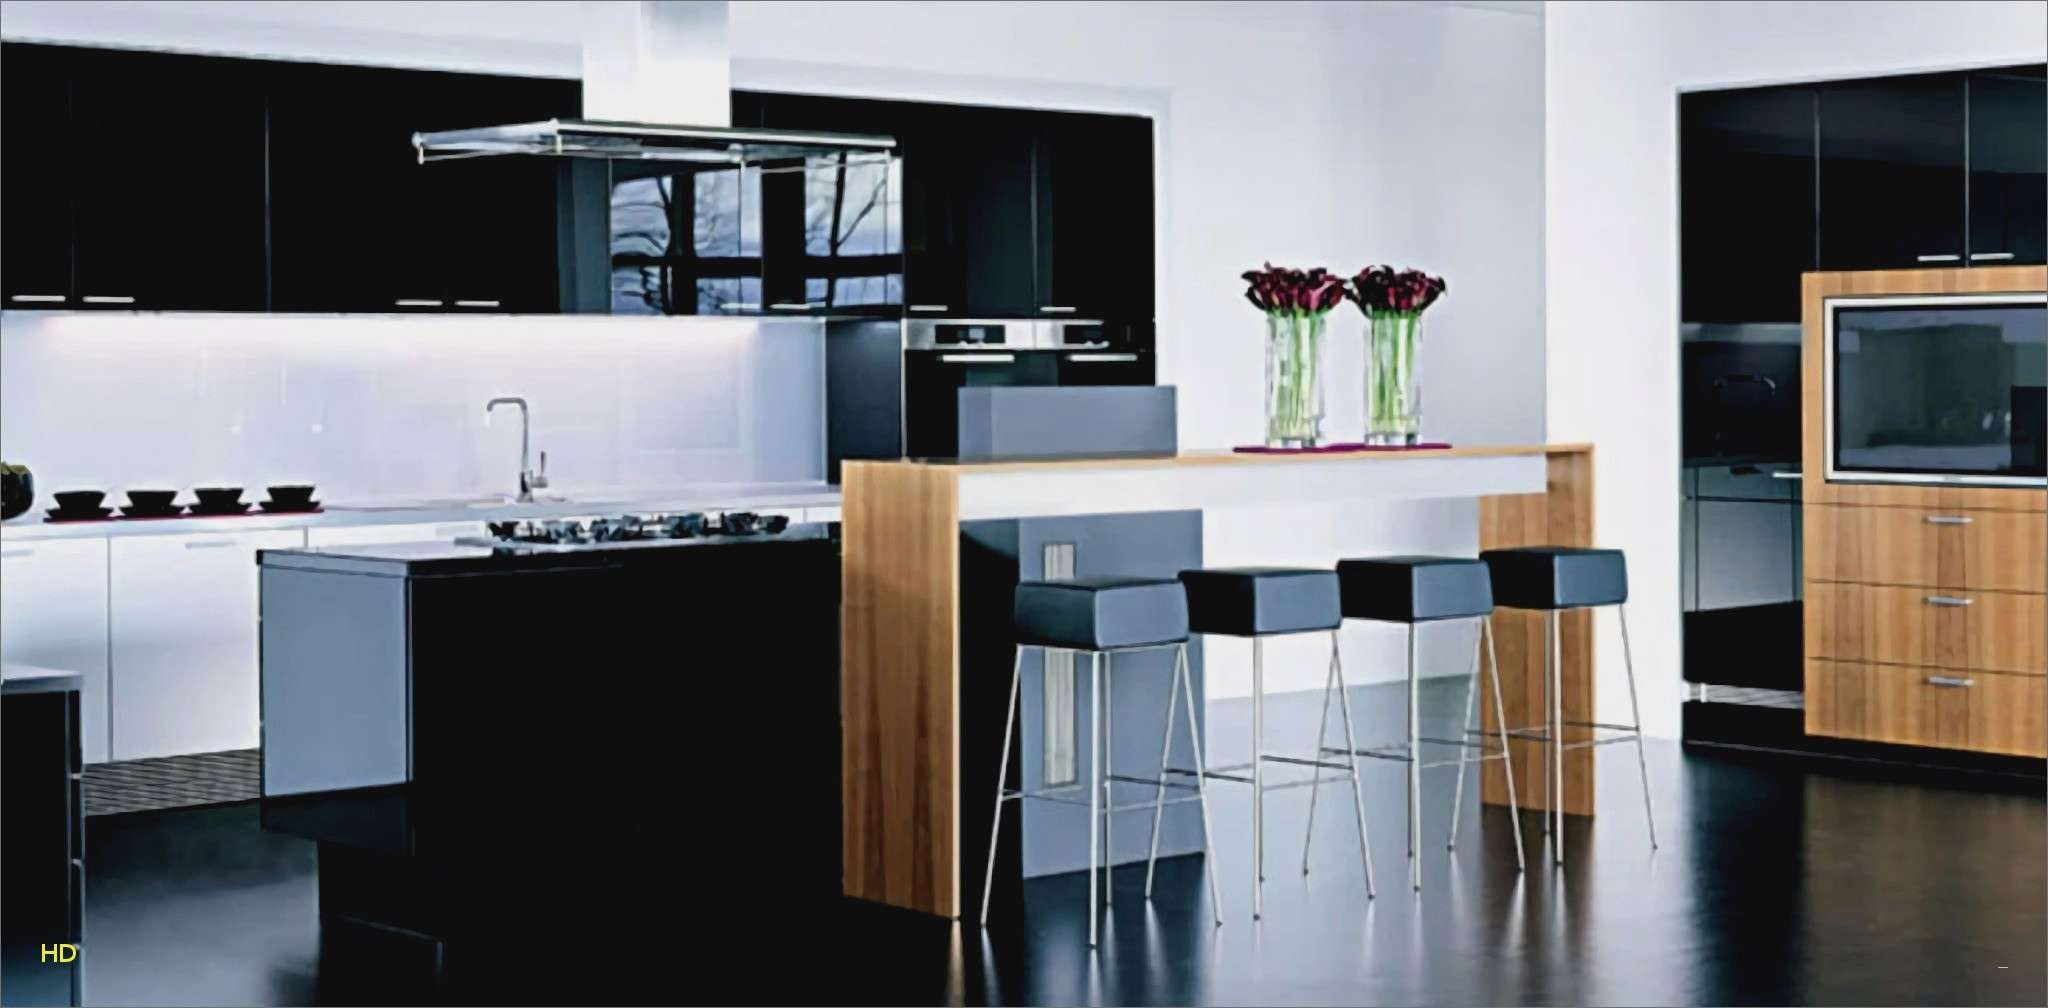 L Kuche Mit Insel Schon Kuche Mit Kochinsel Modern Beatrixcottonpants System Kitchen Ikea Drawer Organizer Kitchen